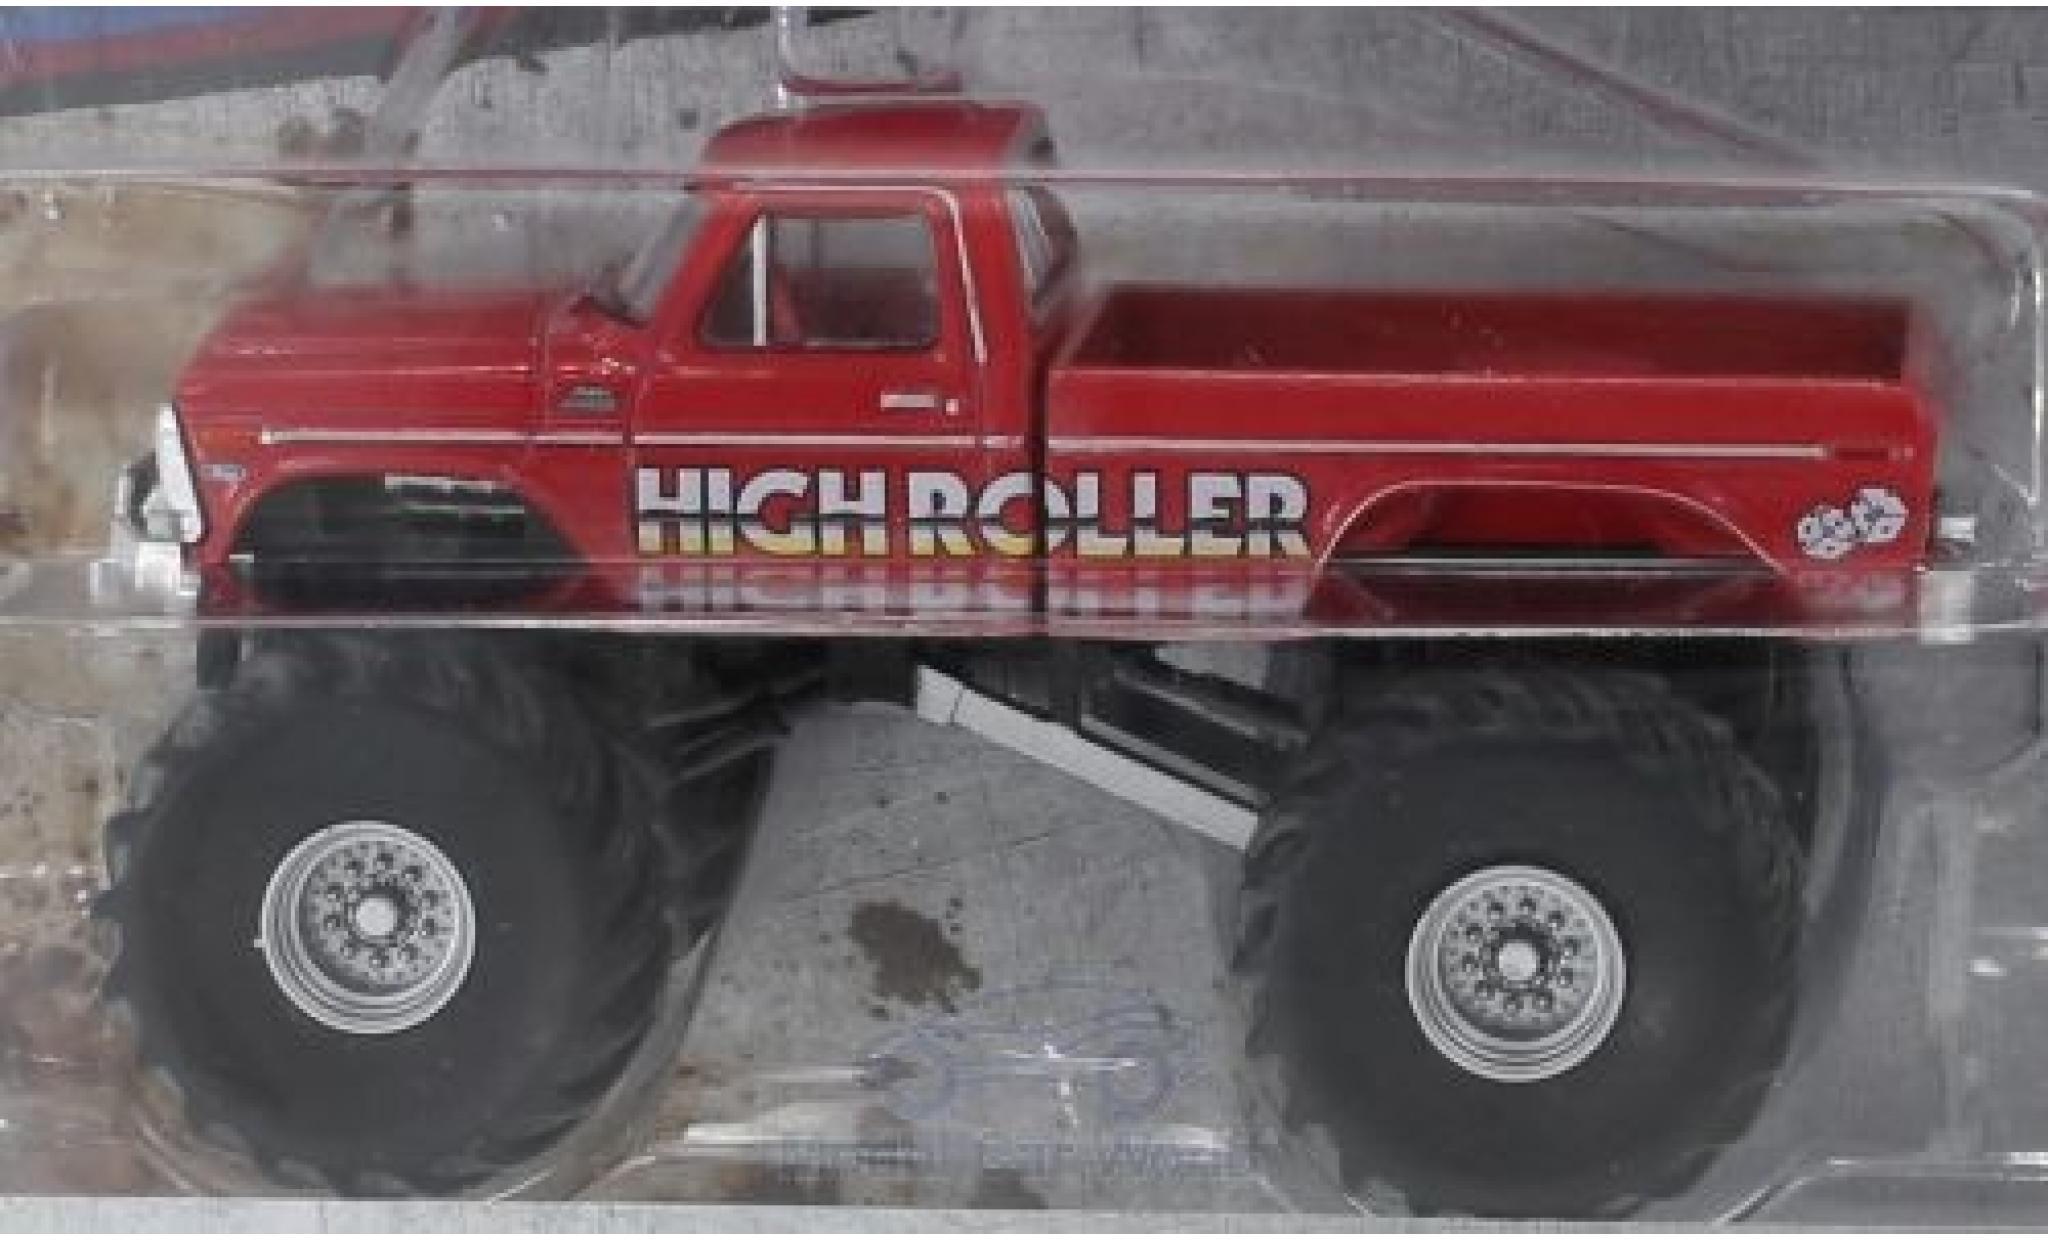 Ford F-350 1/64 Greenlight Monster Truck High Roller 1979